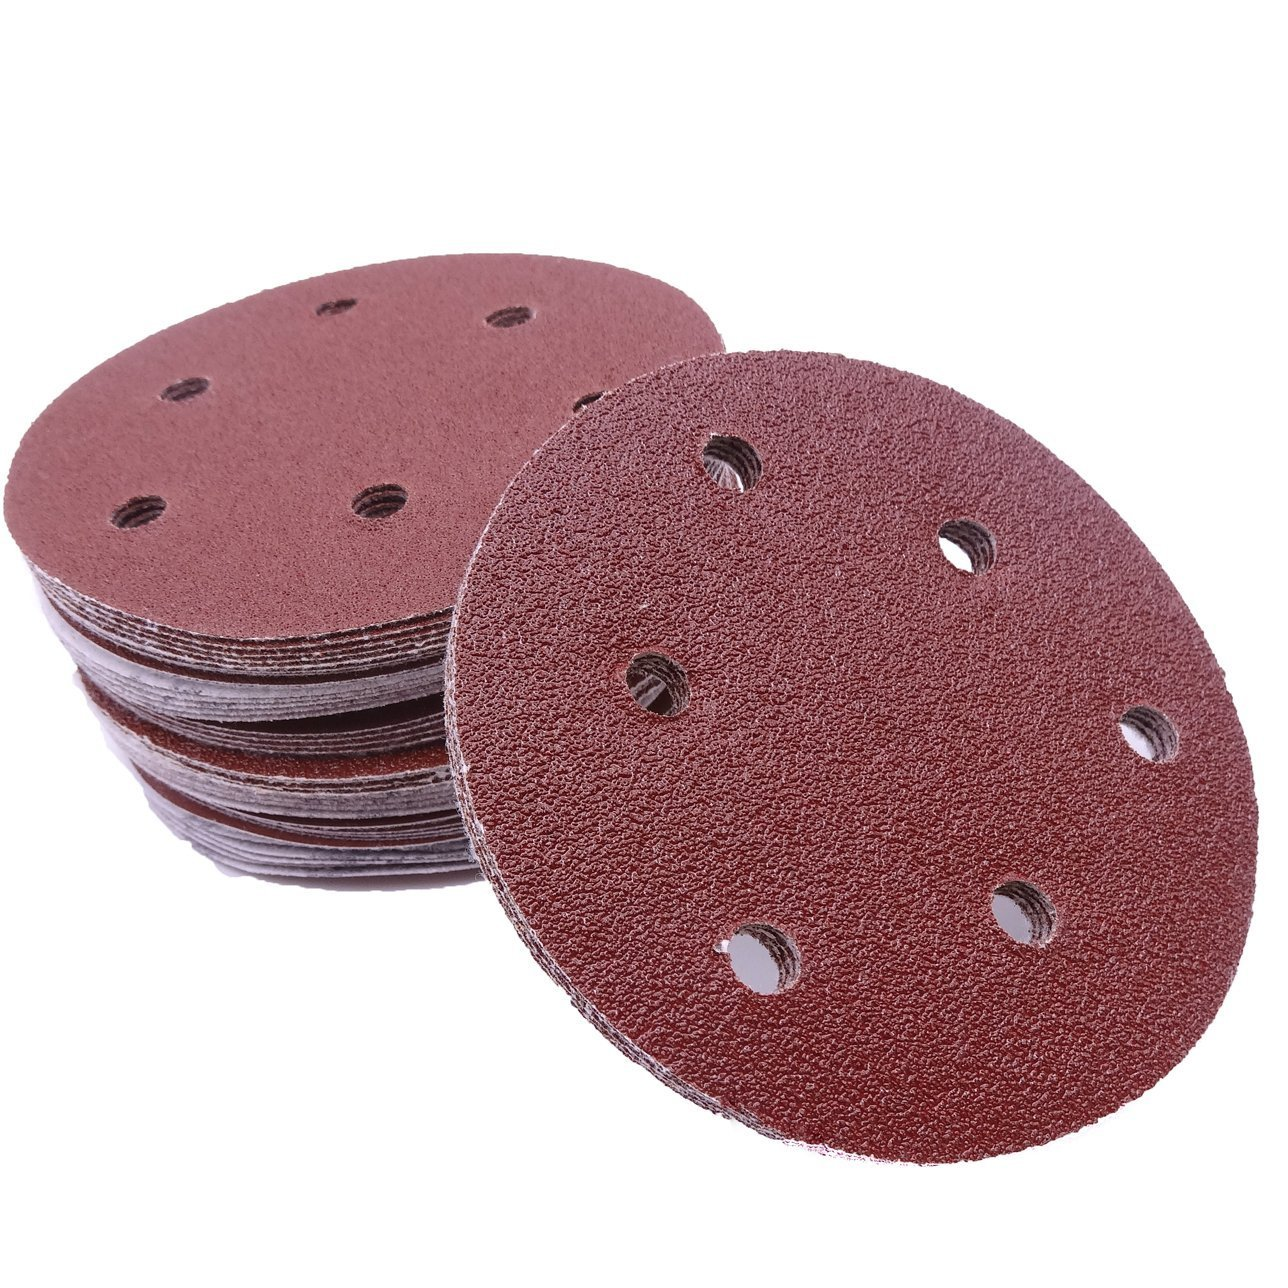 Maveek 60 Pieces 6-Holes Discs Pads 5 Inch/ 125 mm Hook and Loop 40/60/ 80/120/ 180/240 Assorted Grits 6 Models, Each Model 10 Pieces Sandpaper Sanding Discs Pads for Random Orbital Sander